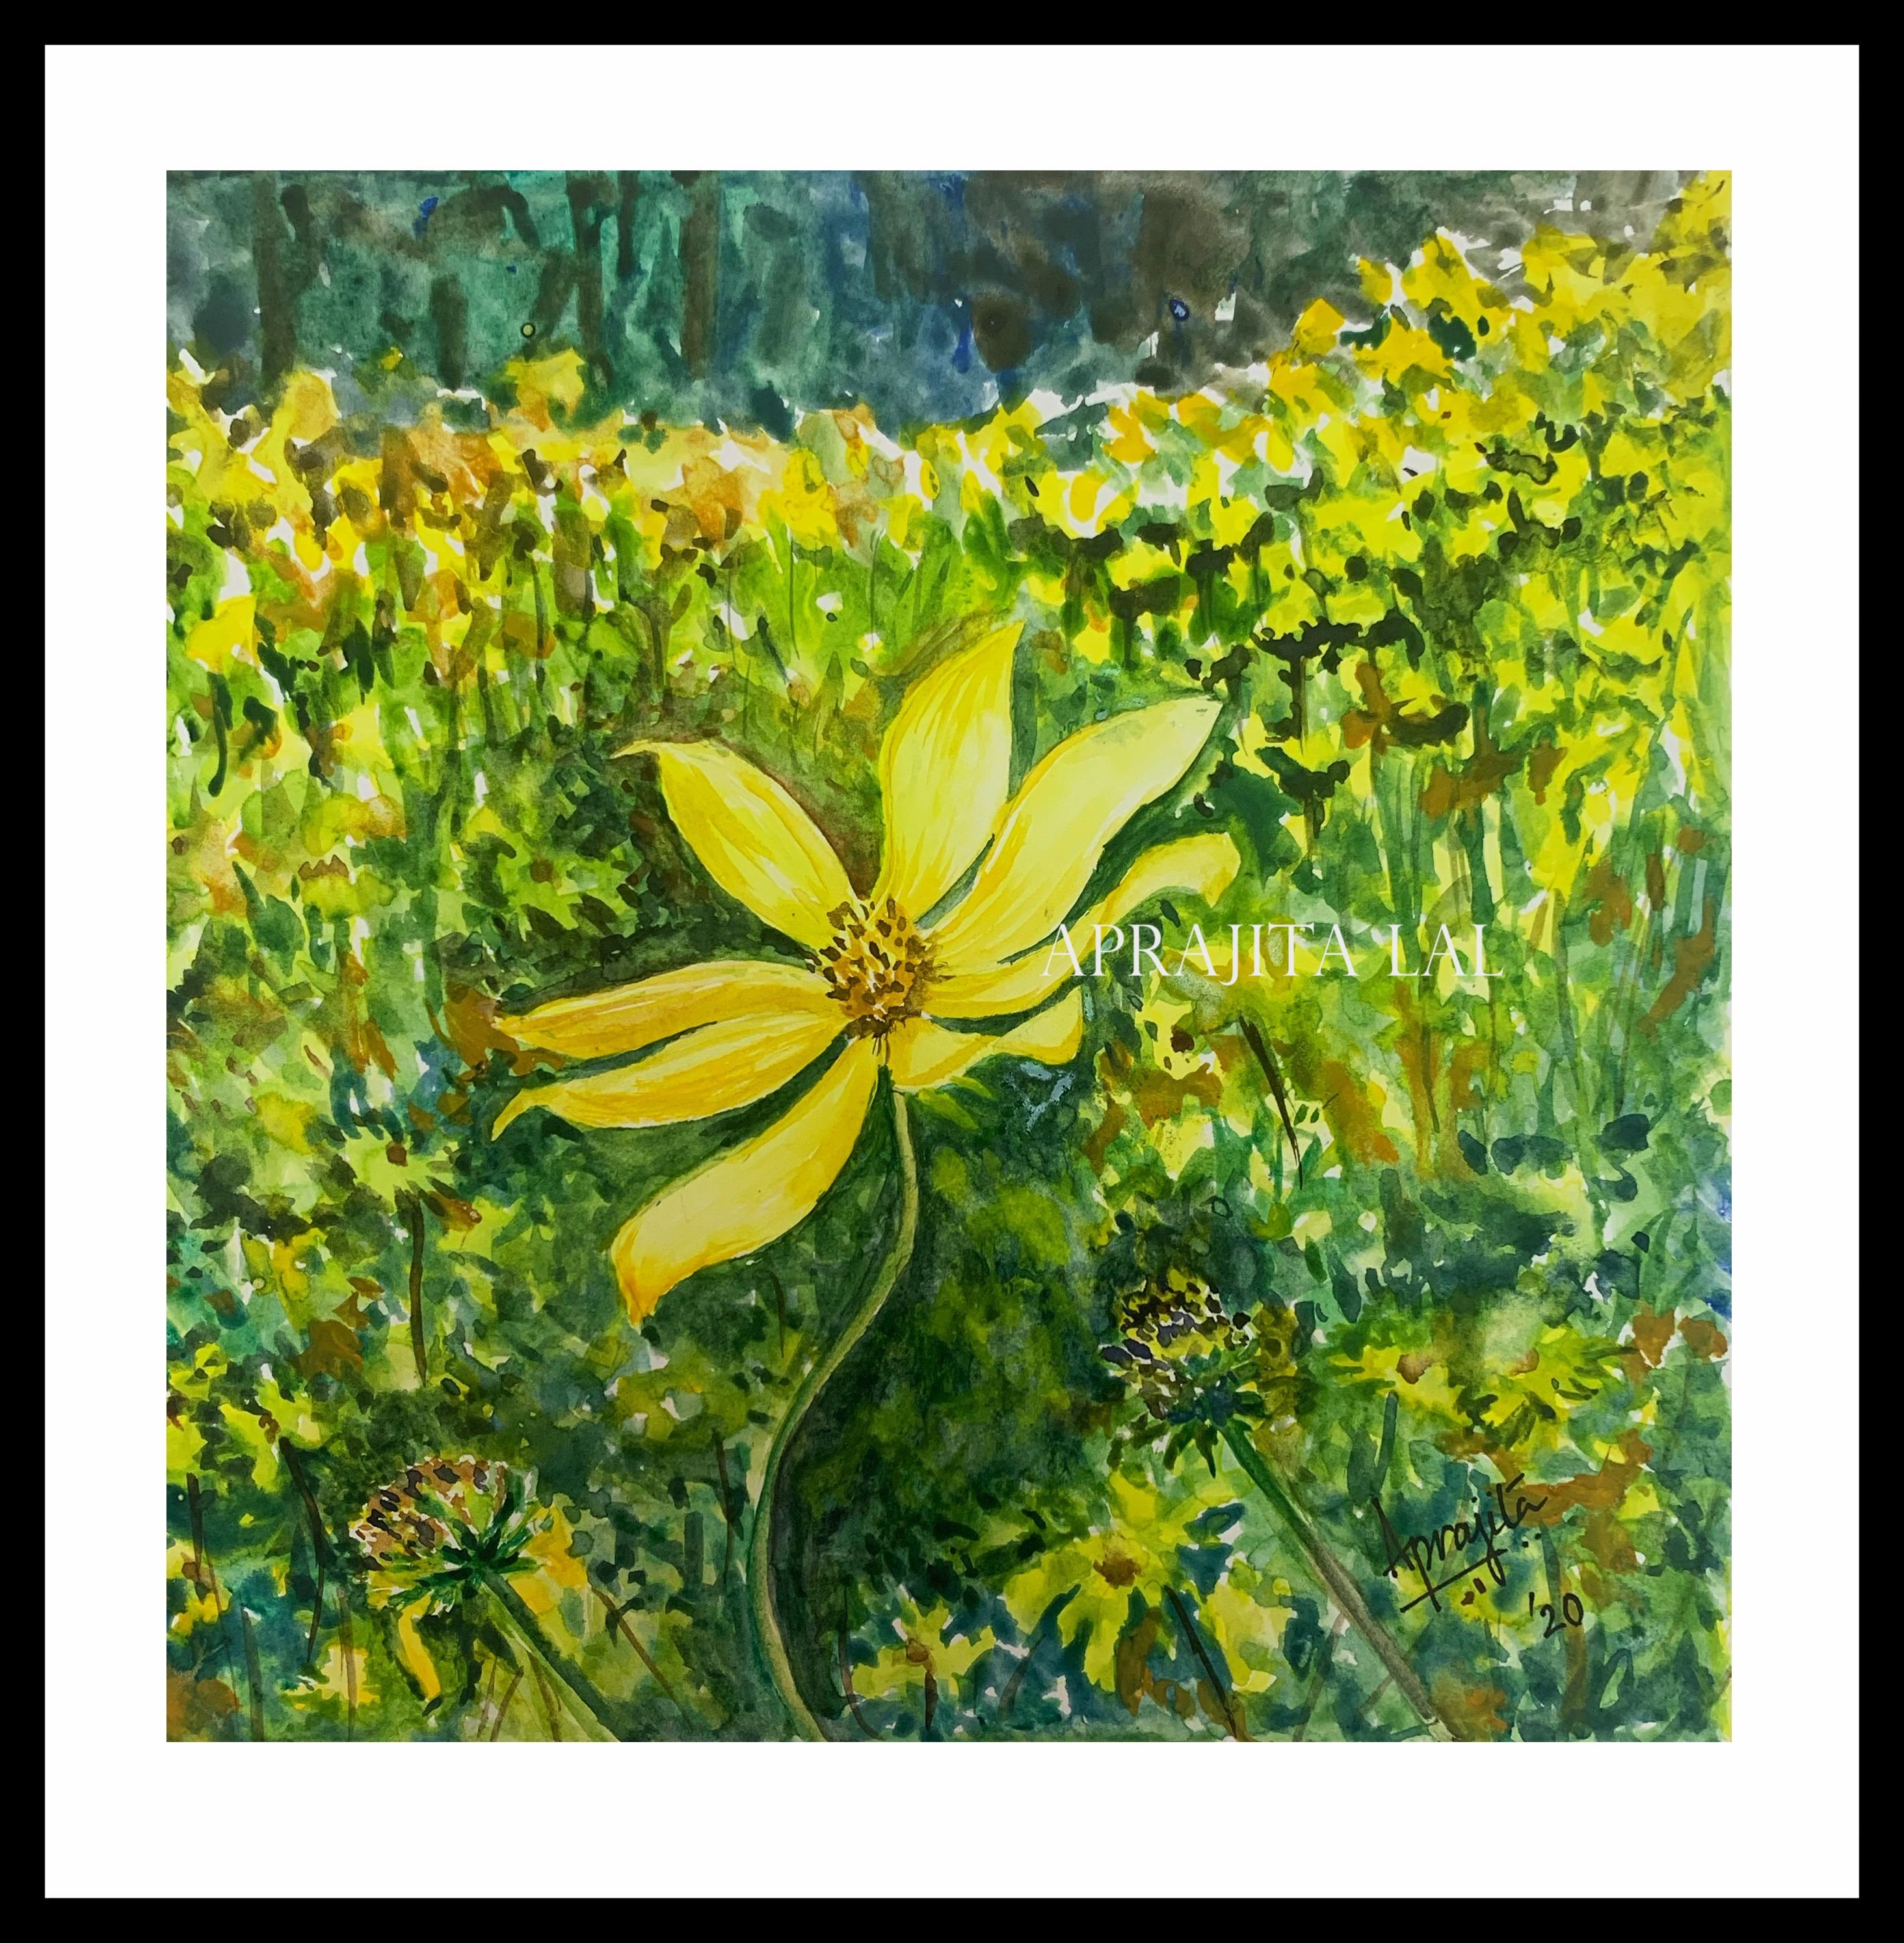 A trail of yellow flowers wm psenig